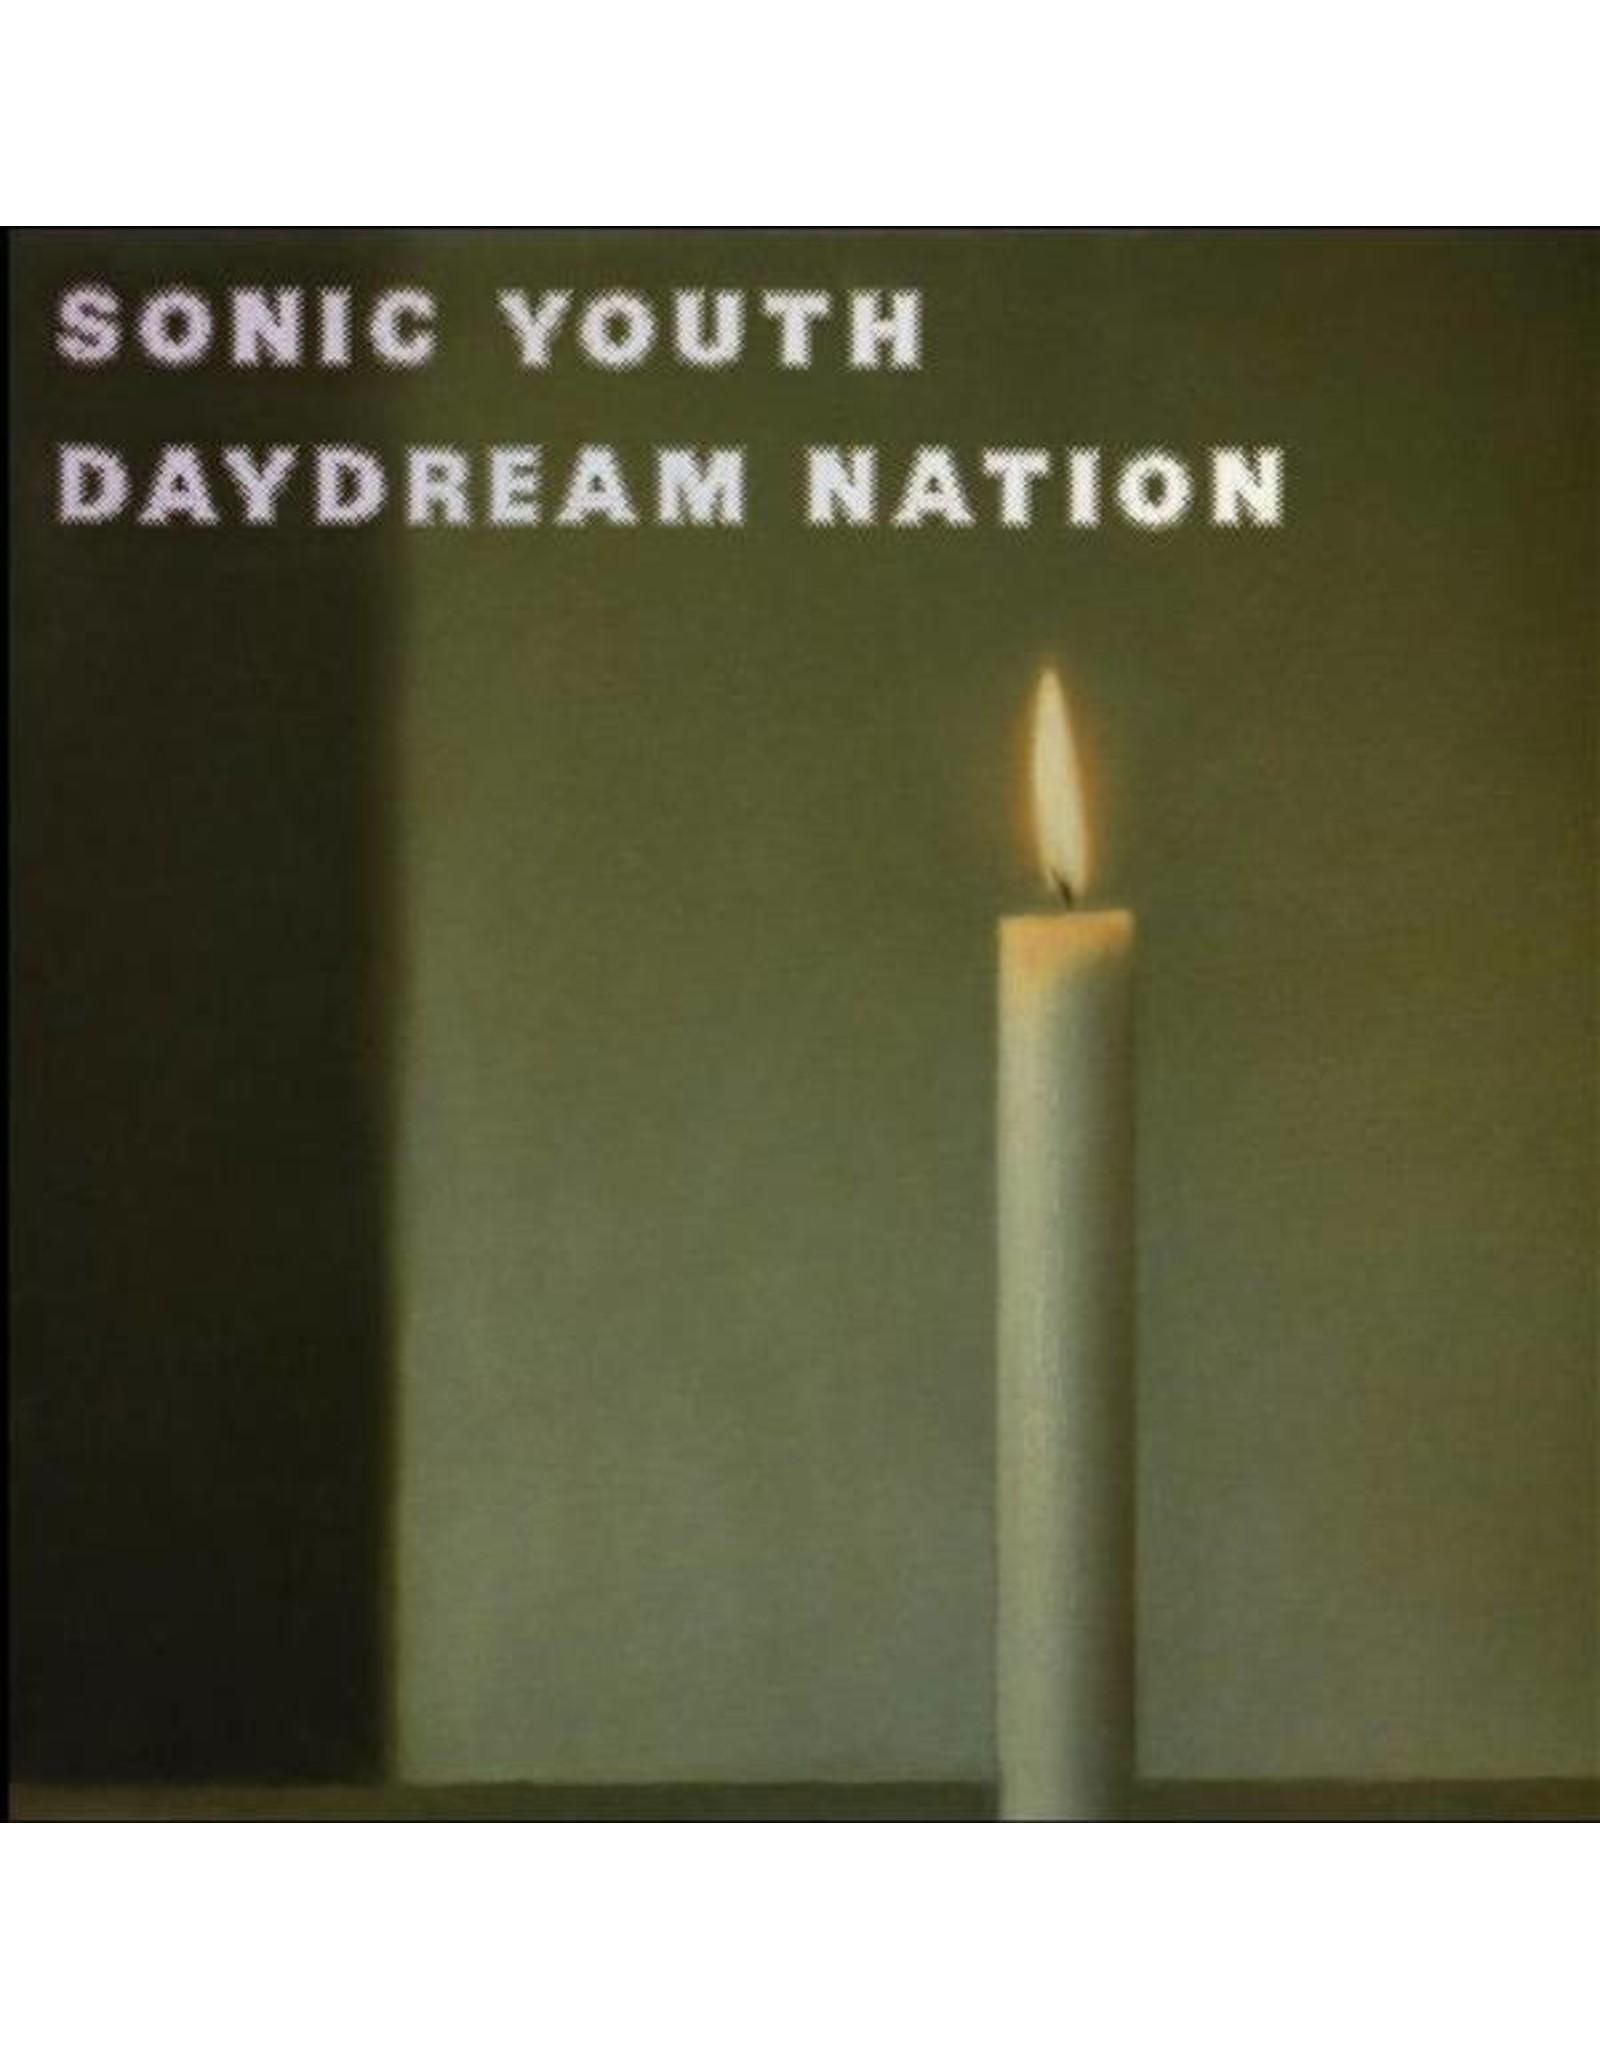 New Vinyl Sonic Youth - Daydream Nation 2LP